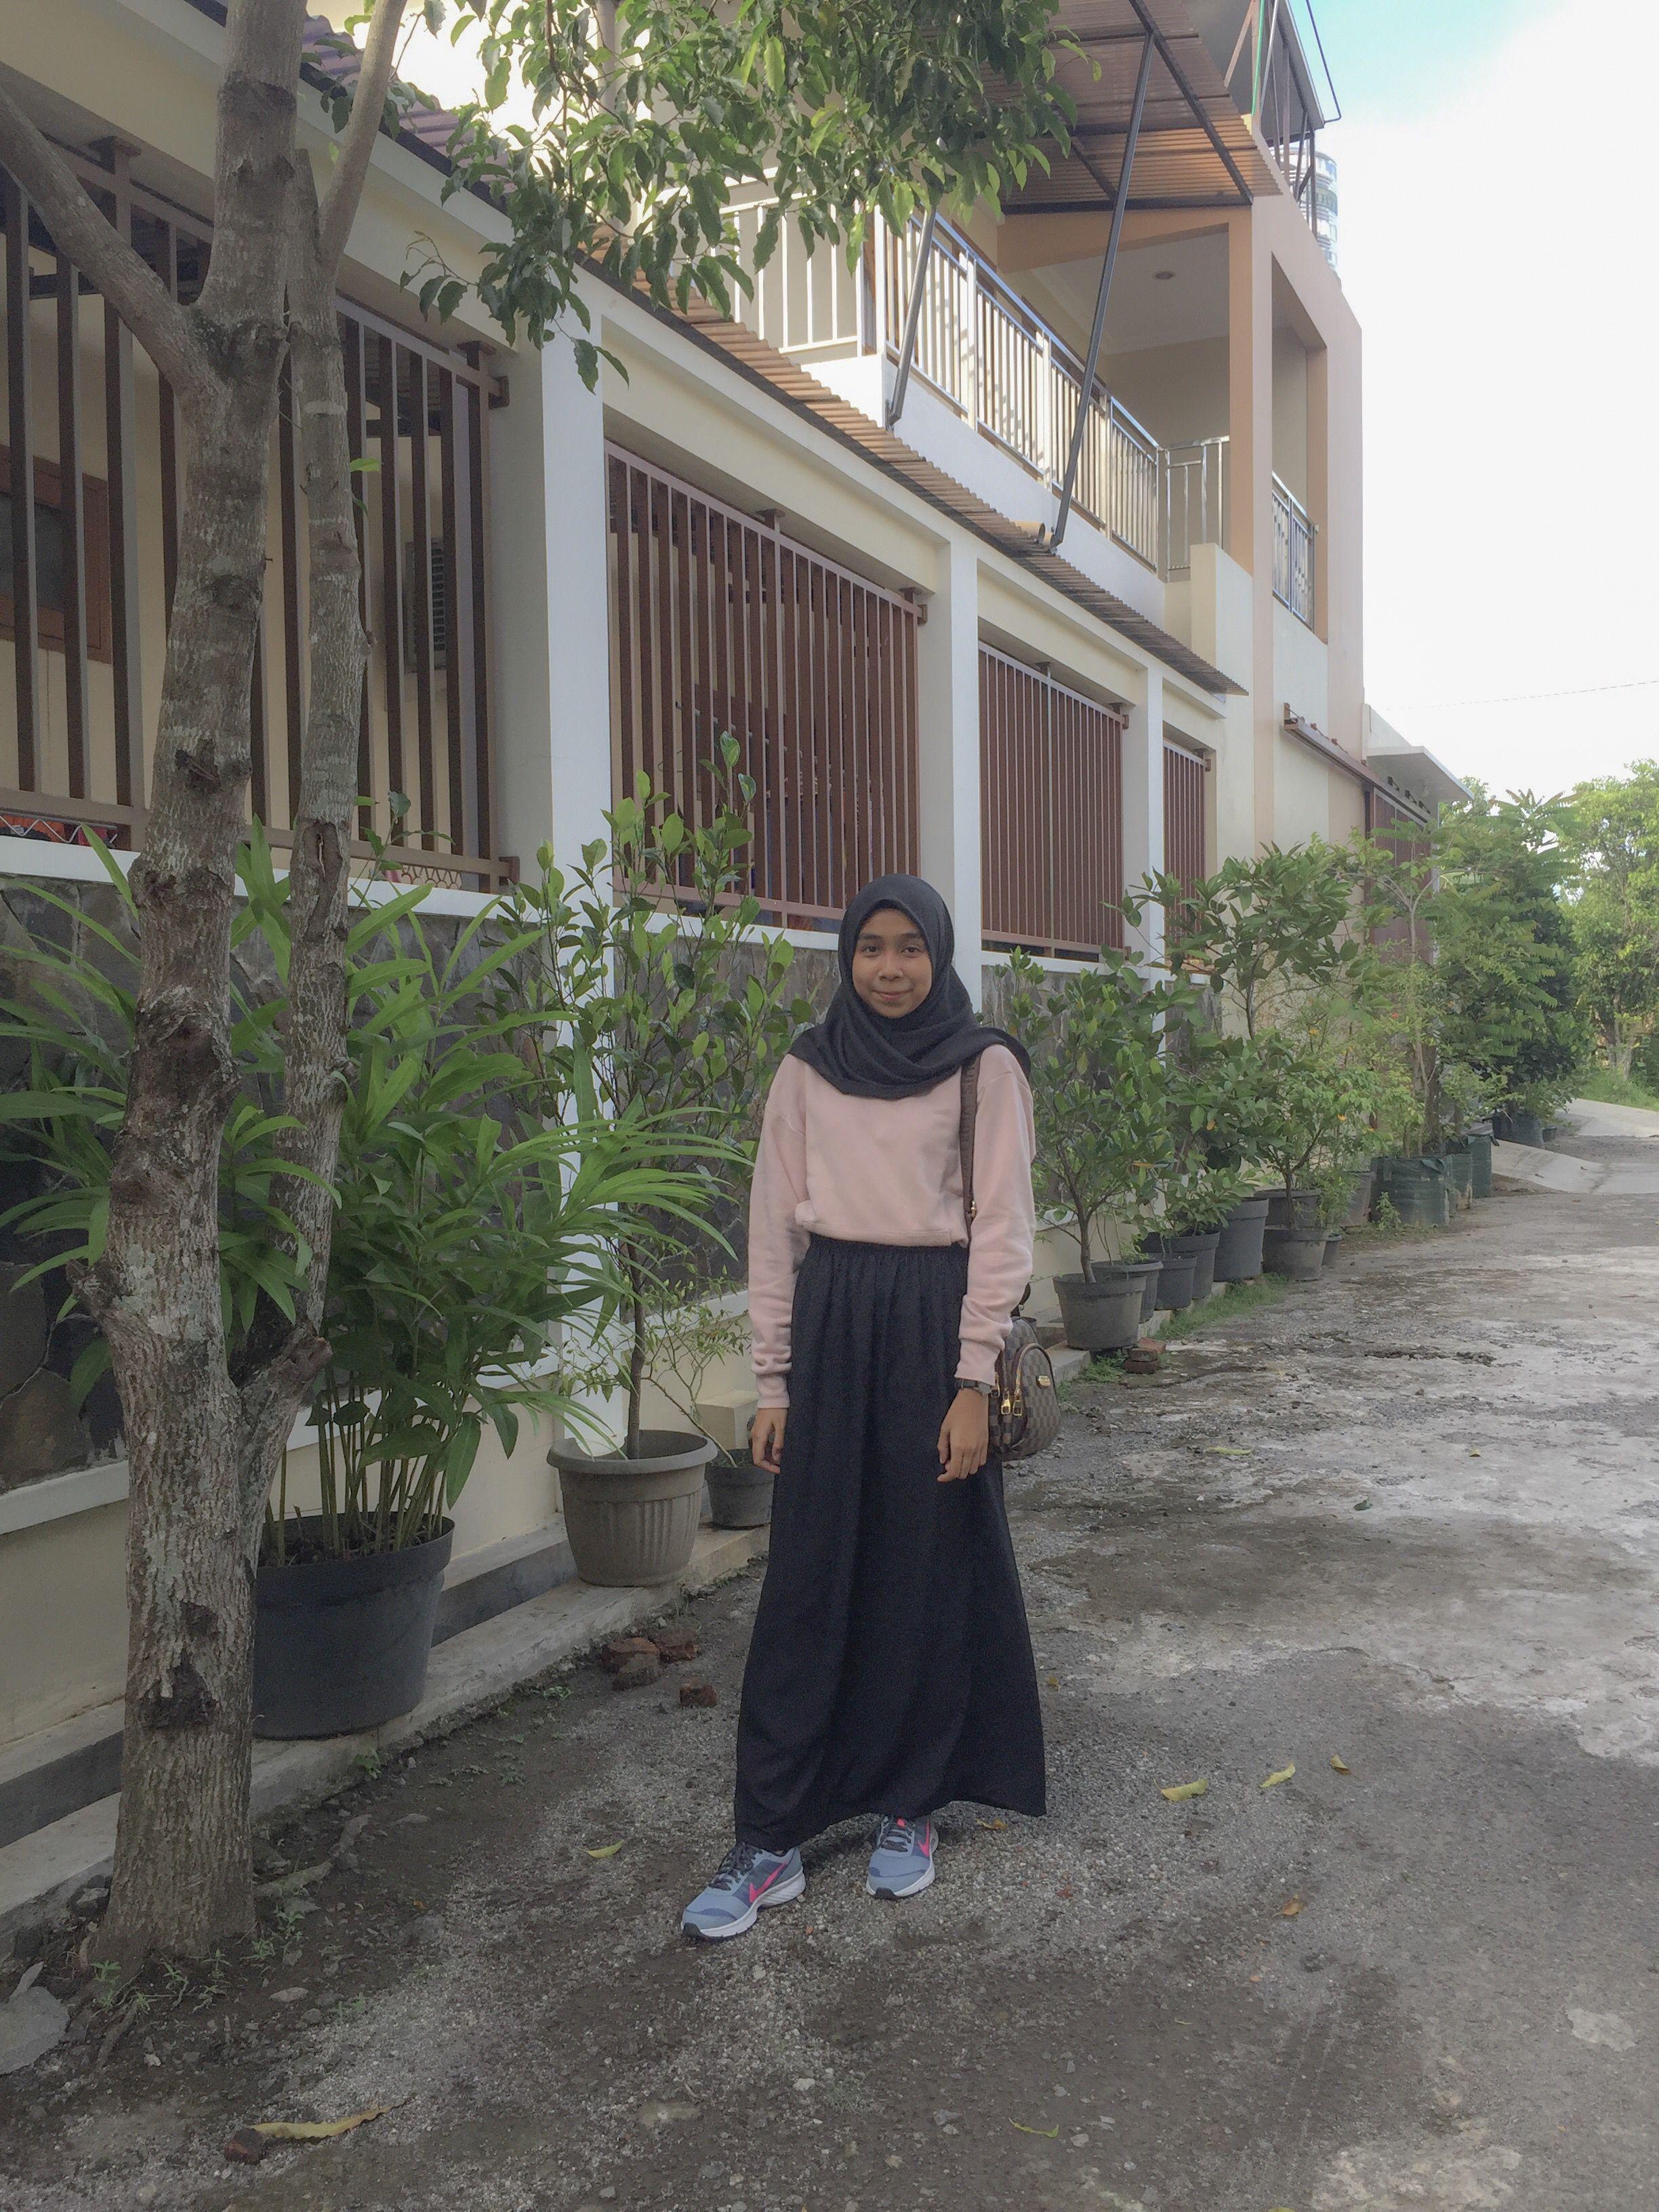 Pin oleh Vira🌸 di Outfit Model pakaian hijab, Wanita